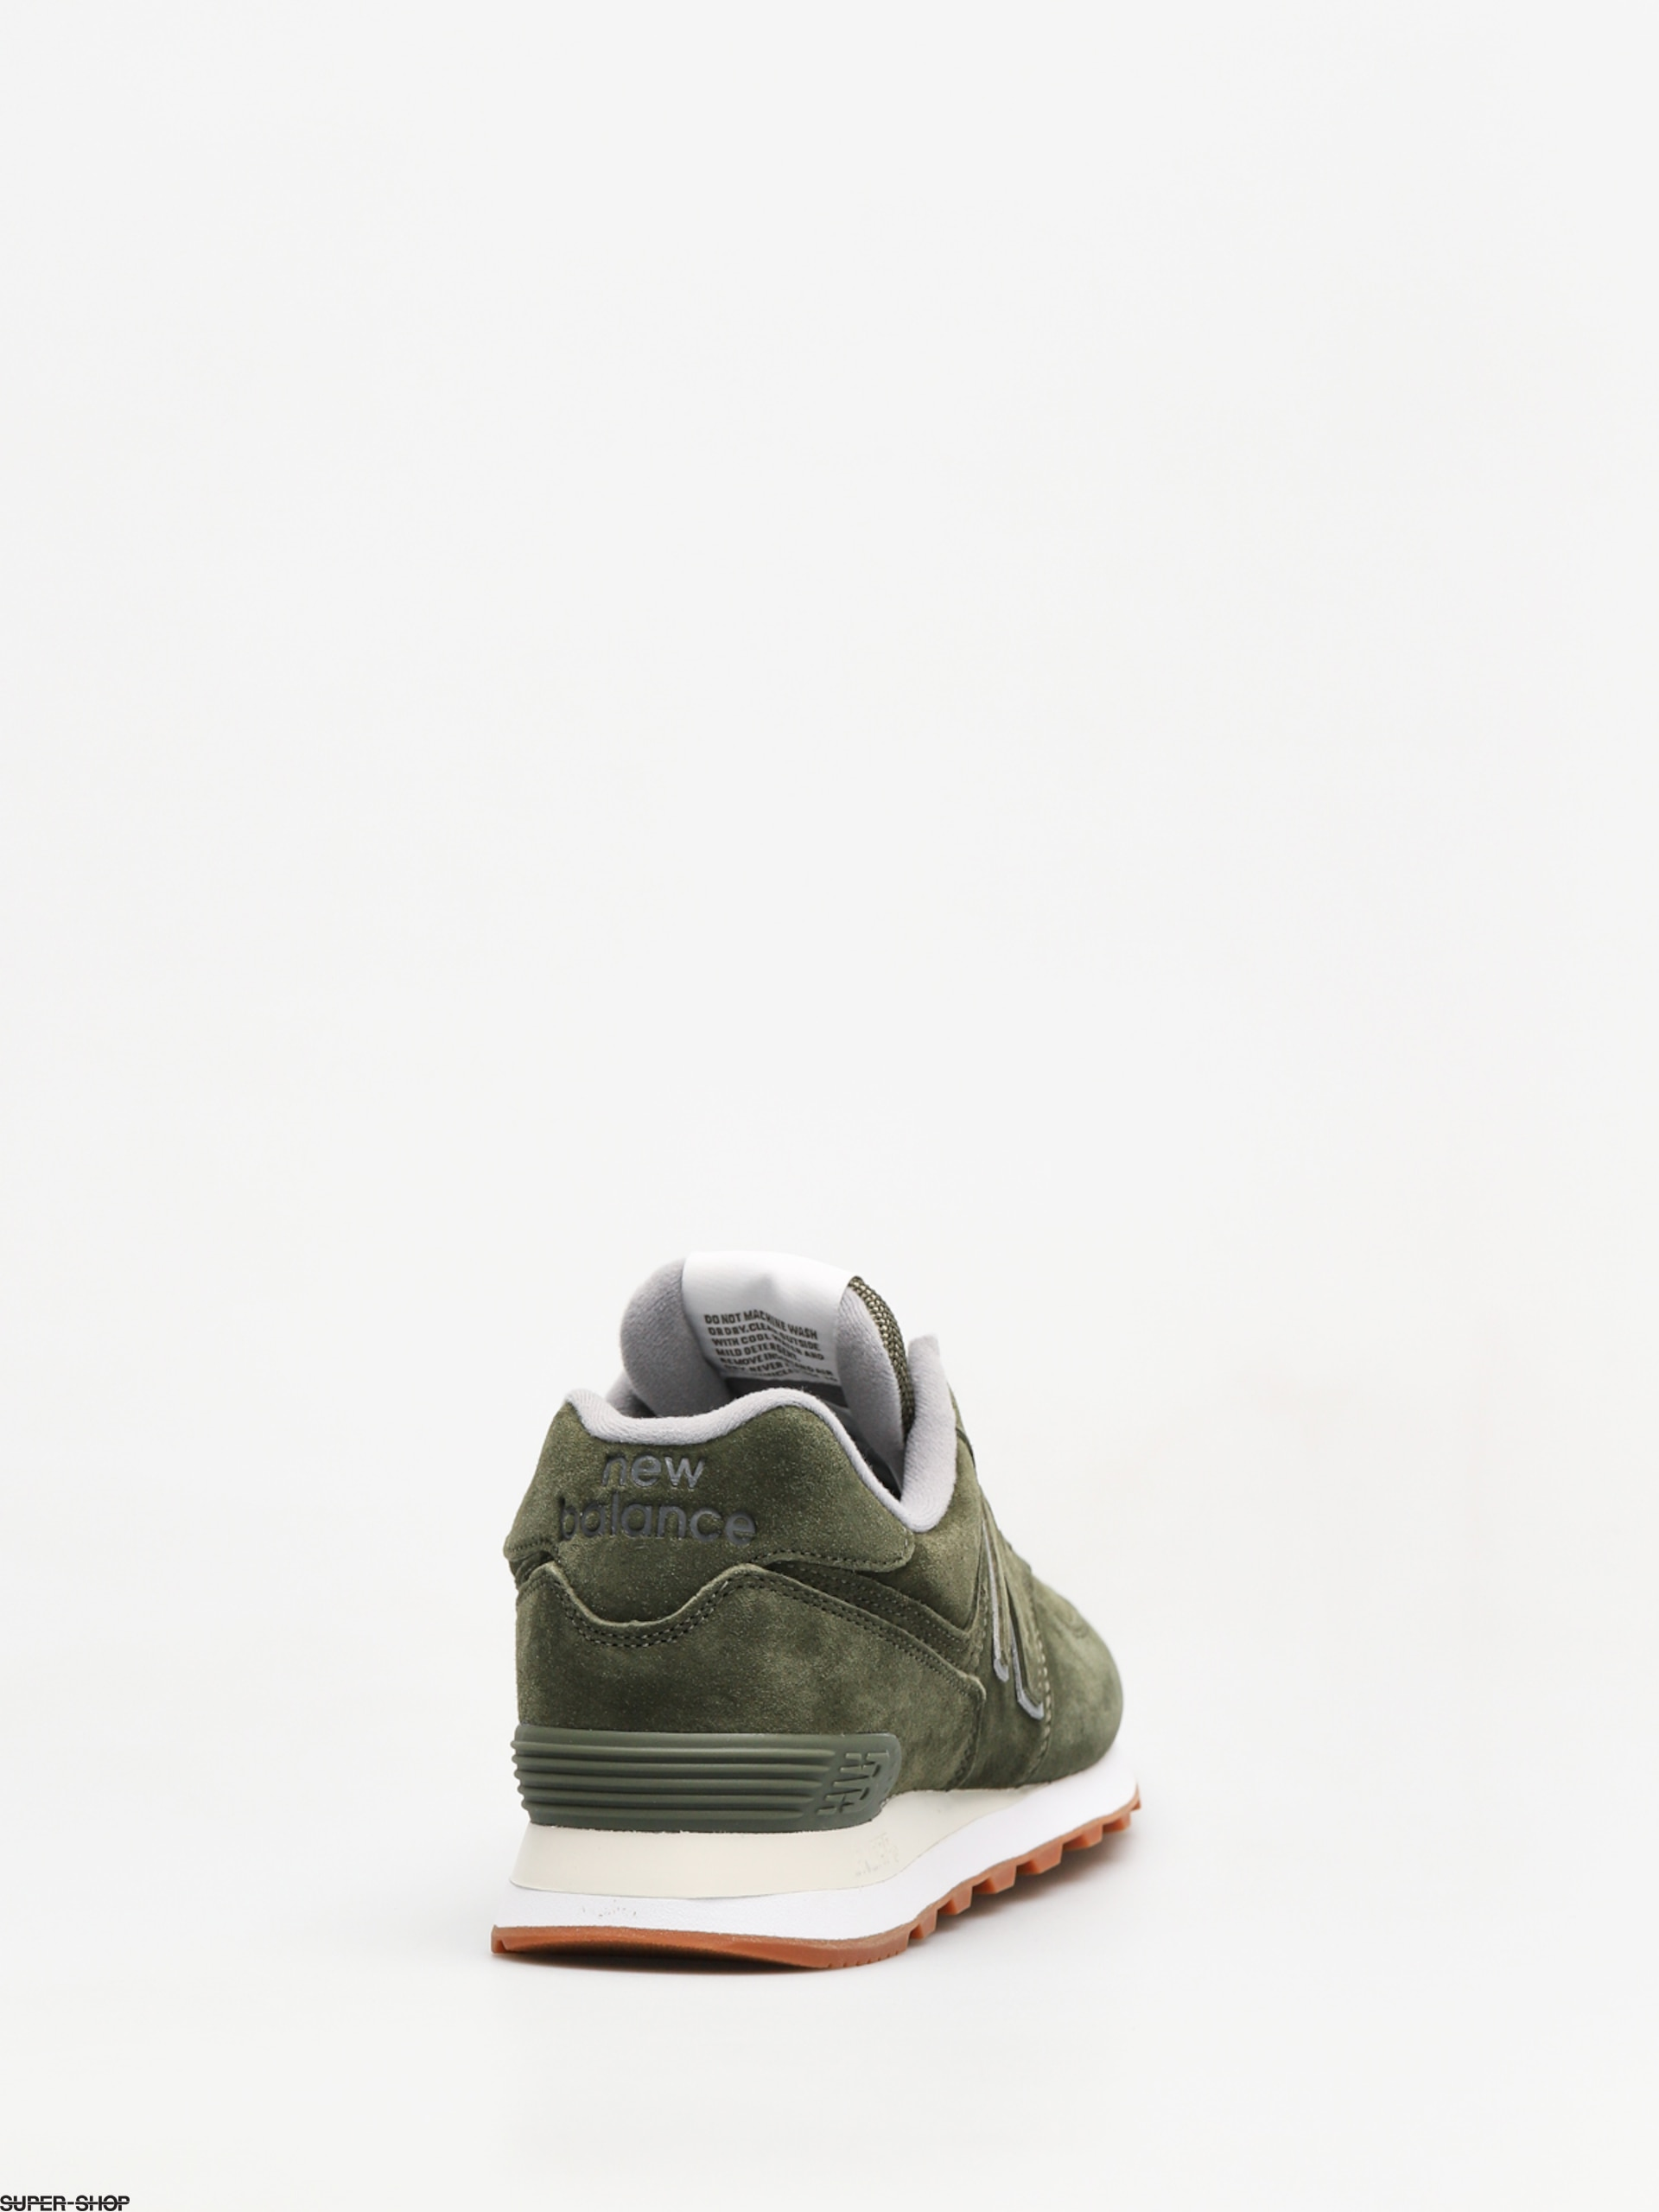 New Balance Shoes 574 (dark covert green)